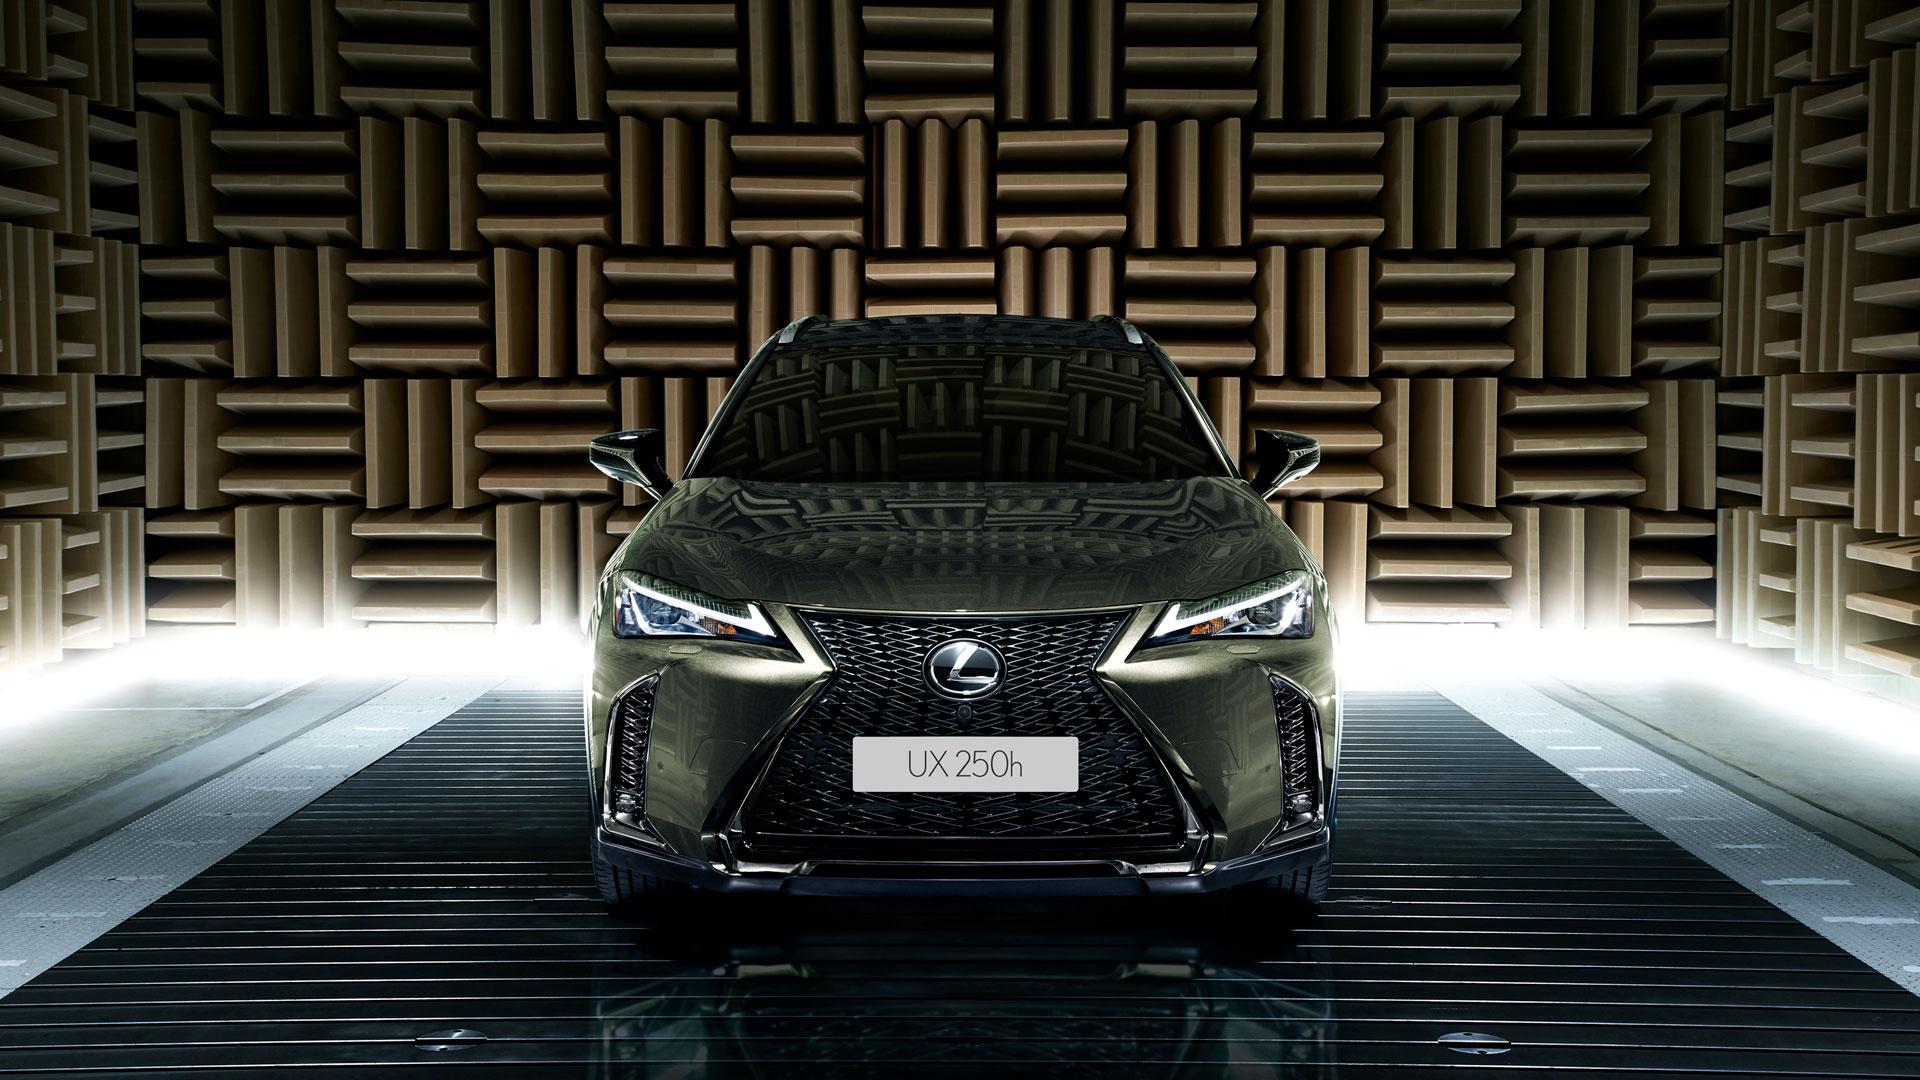 Lexus ux características hero asset